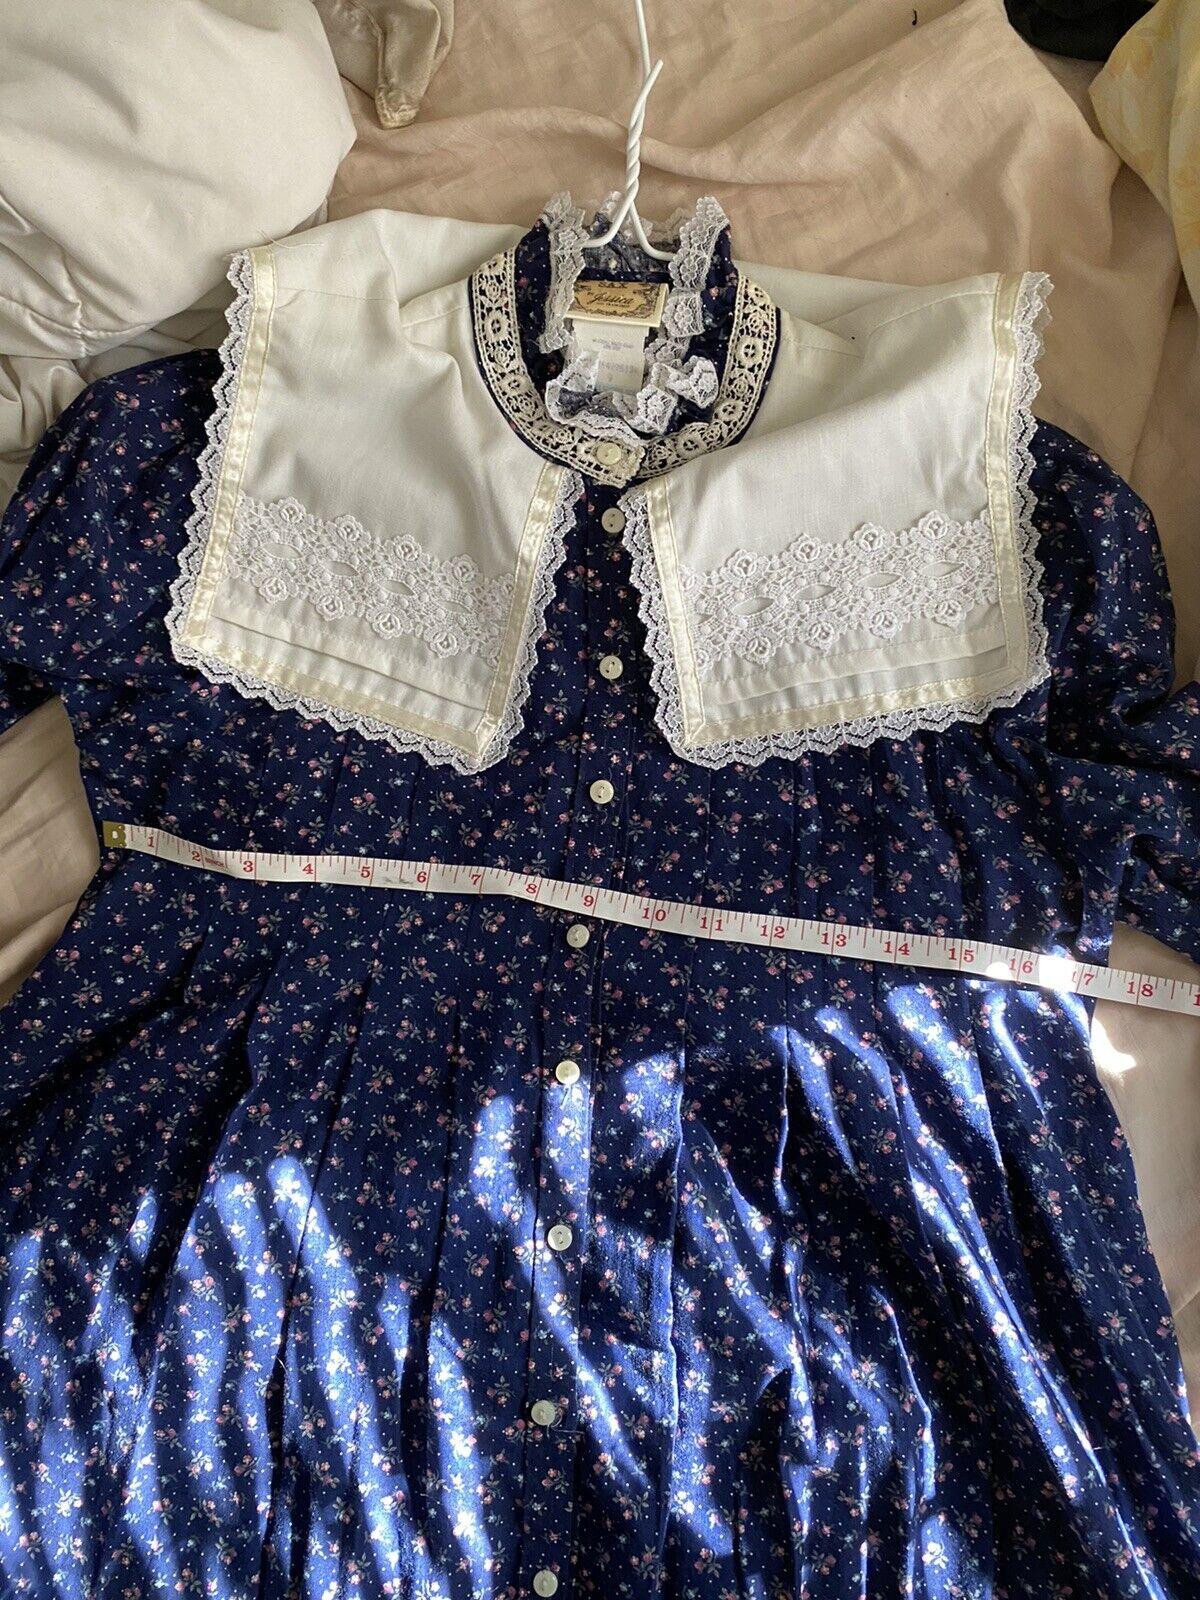 vintage gunne sax prairie dress (size 9) - image 4